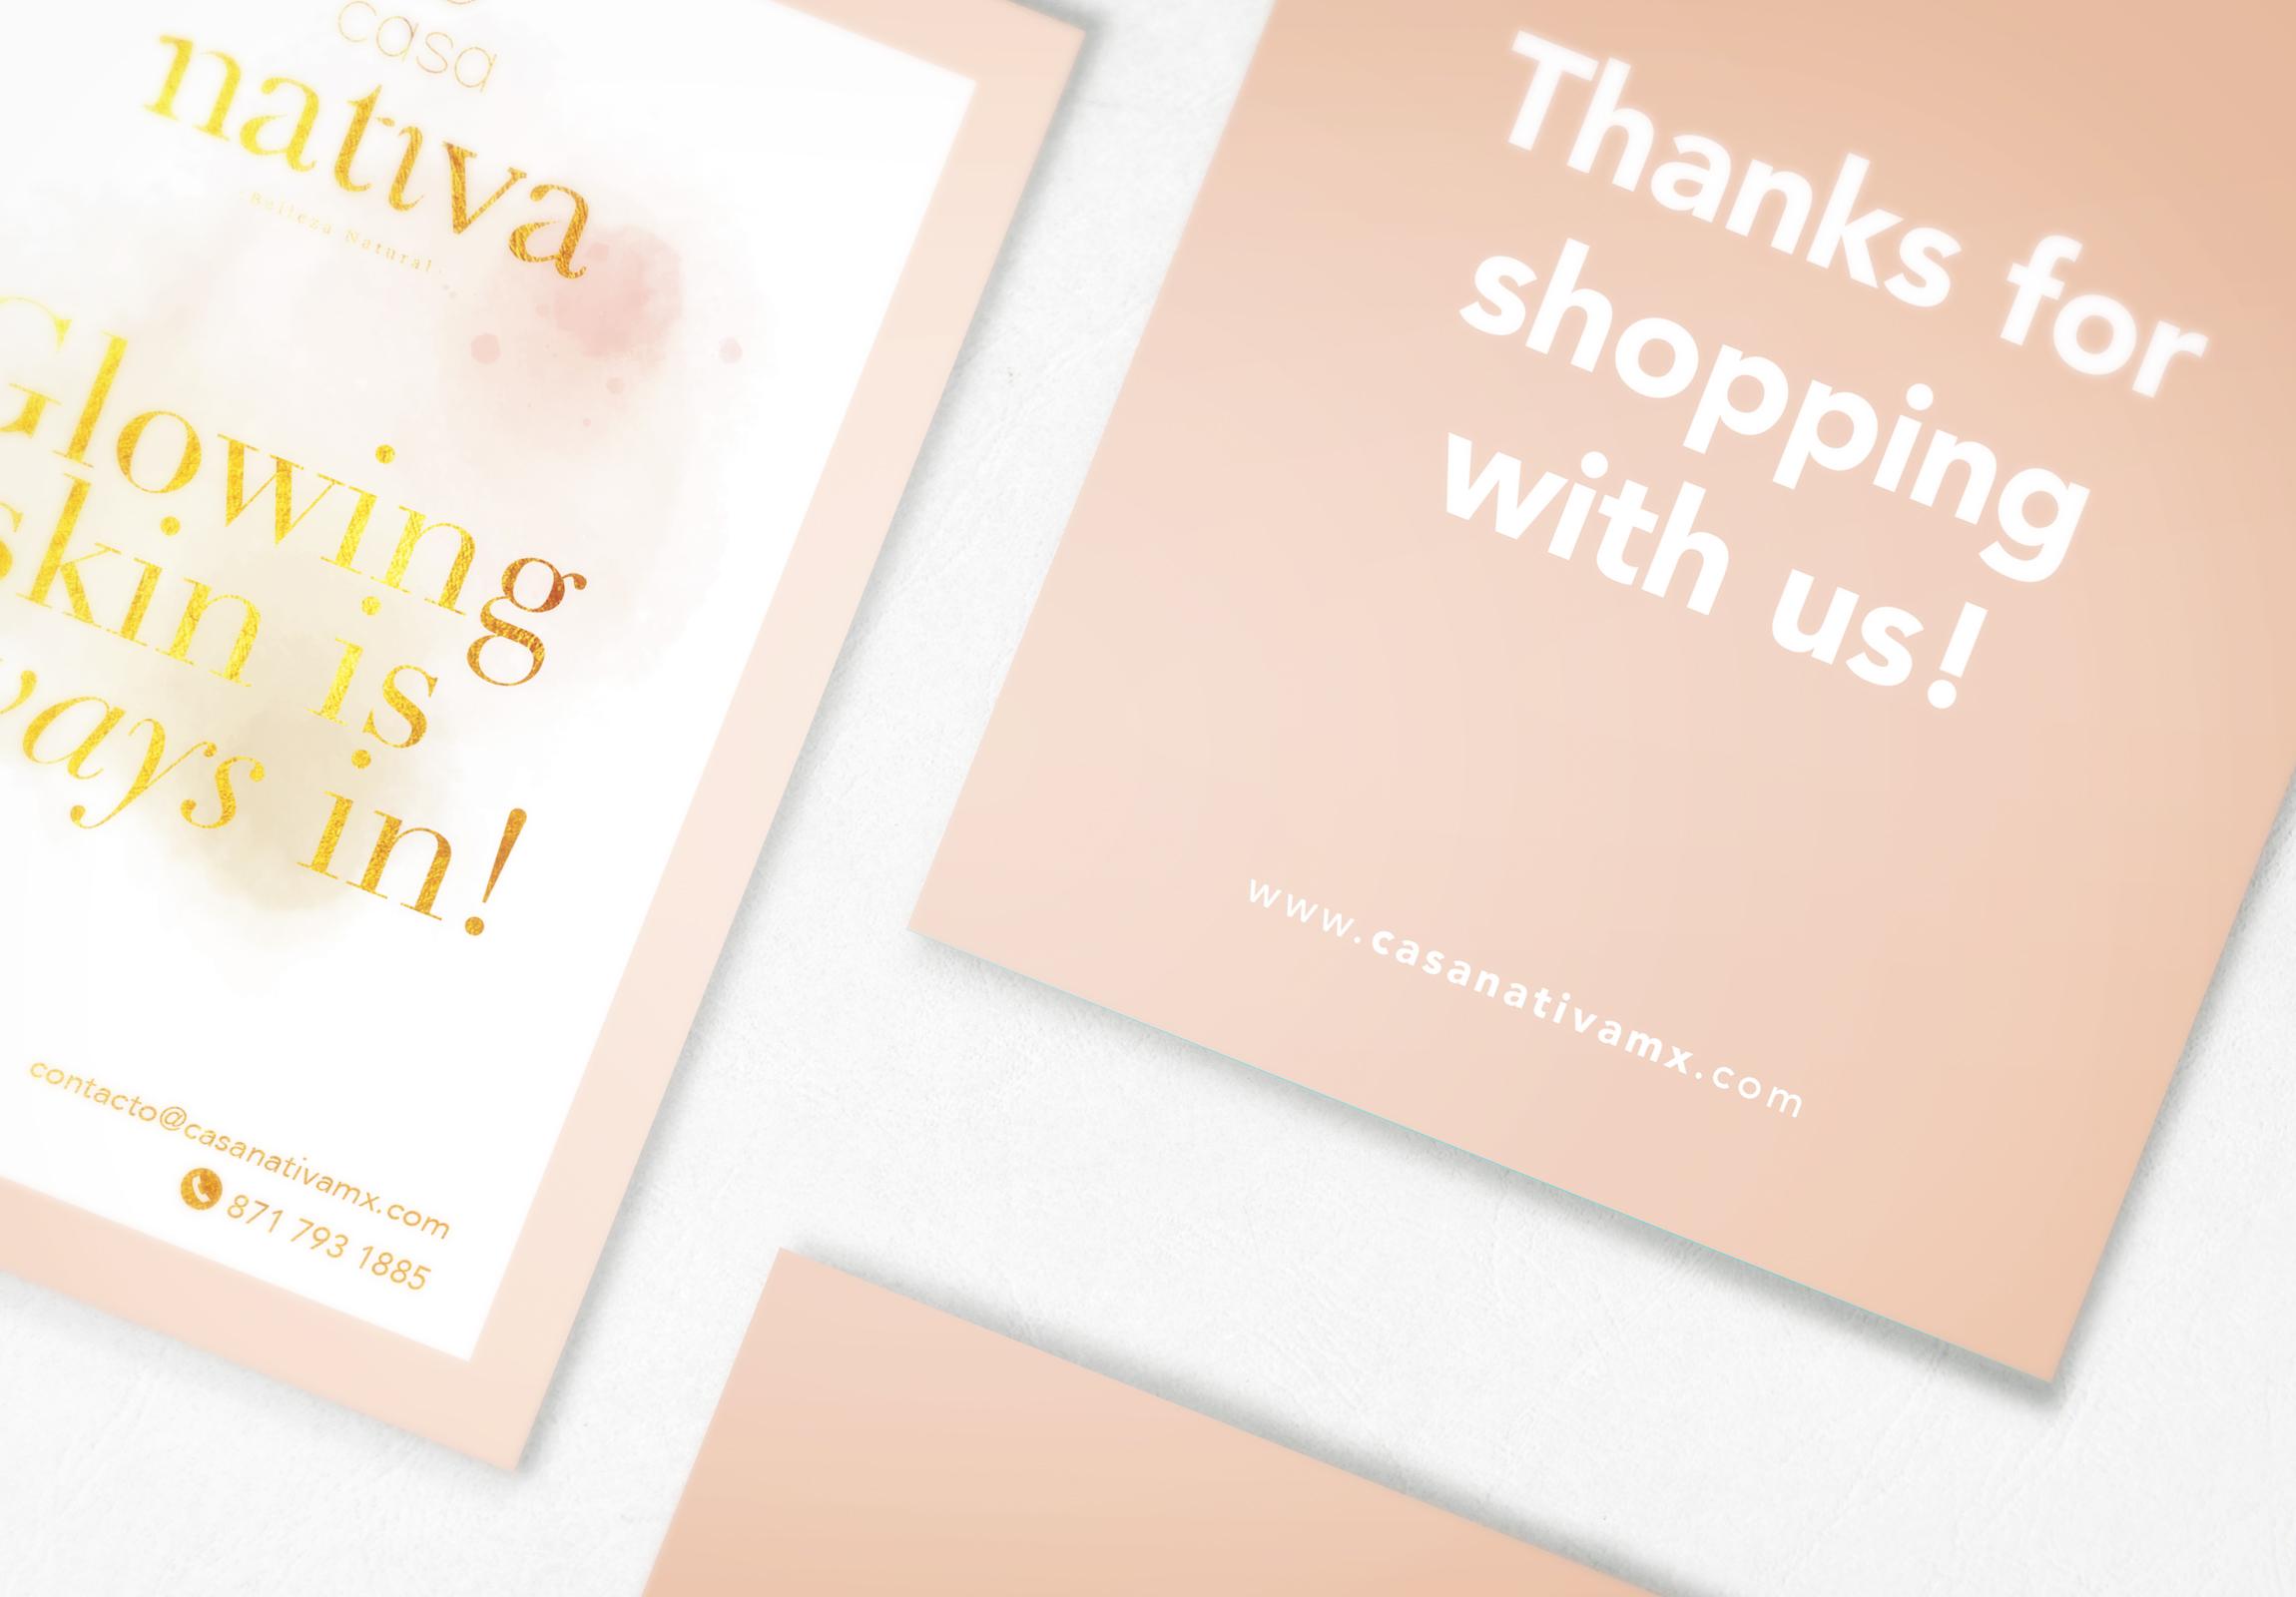 thank-you-cards-casa-nativa-mexico-beauty-store-belleza-organica-papeleria-stationery-design-03.JPG